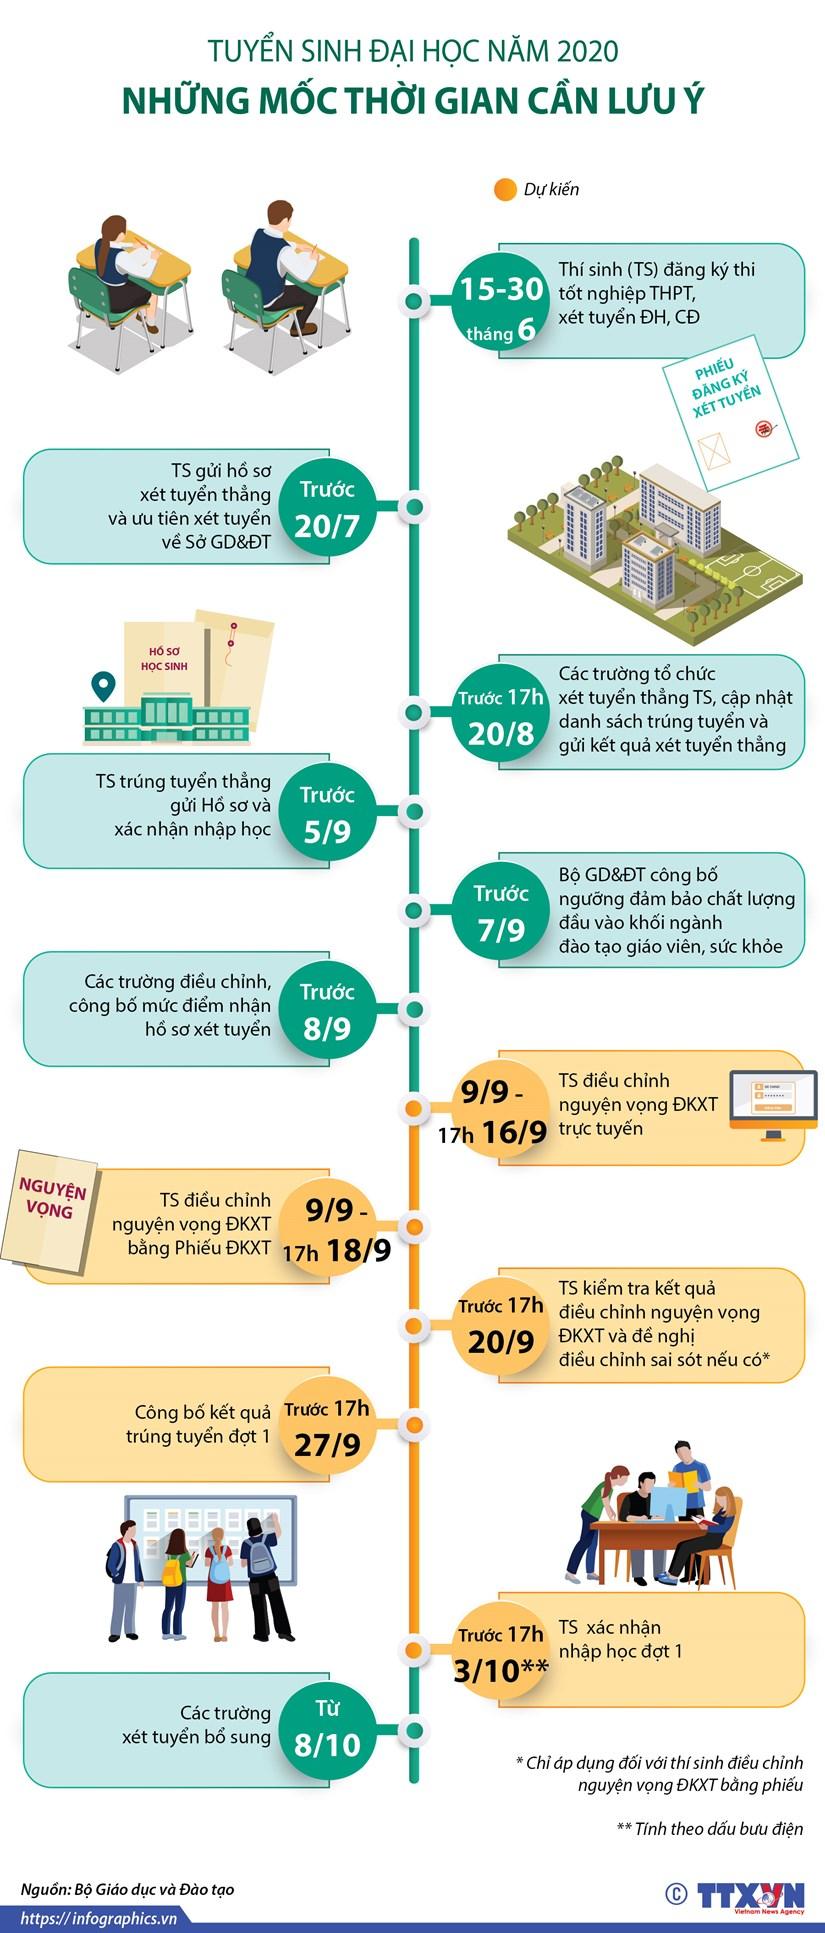 [Infographics] Tuyen sinh Dai hoc 2020: Nhung moc thoi gian can luu y hinh anh 1